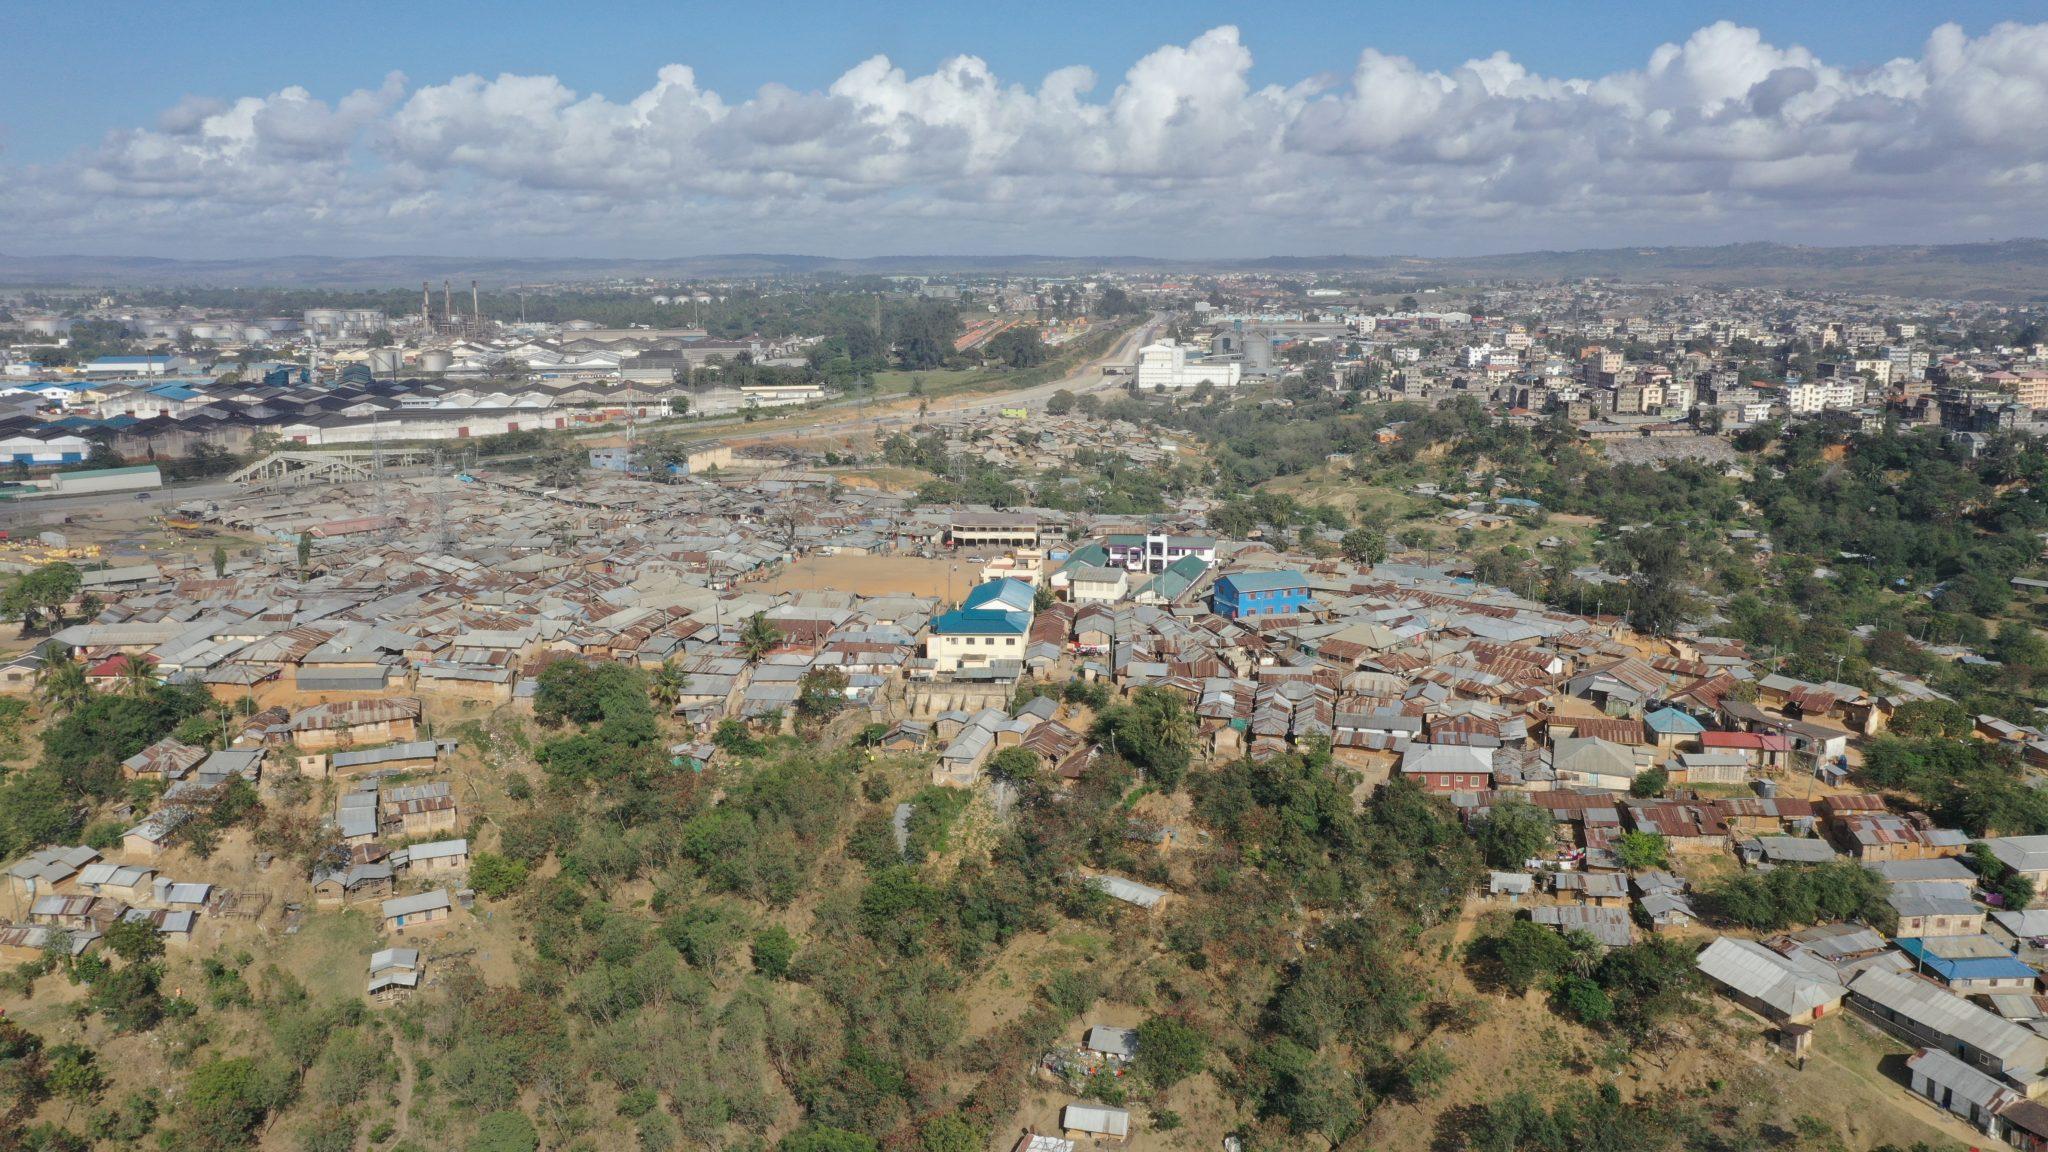 The informal settlement of Bangladesh, in Mombasa, Kenya